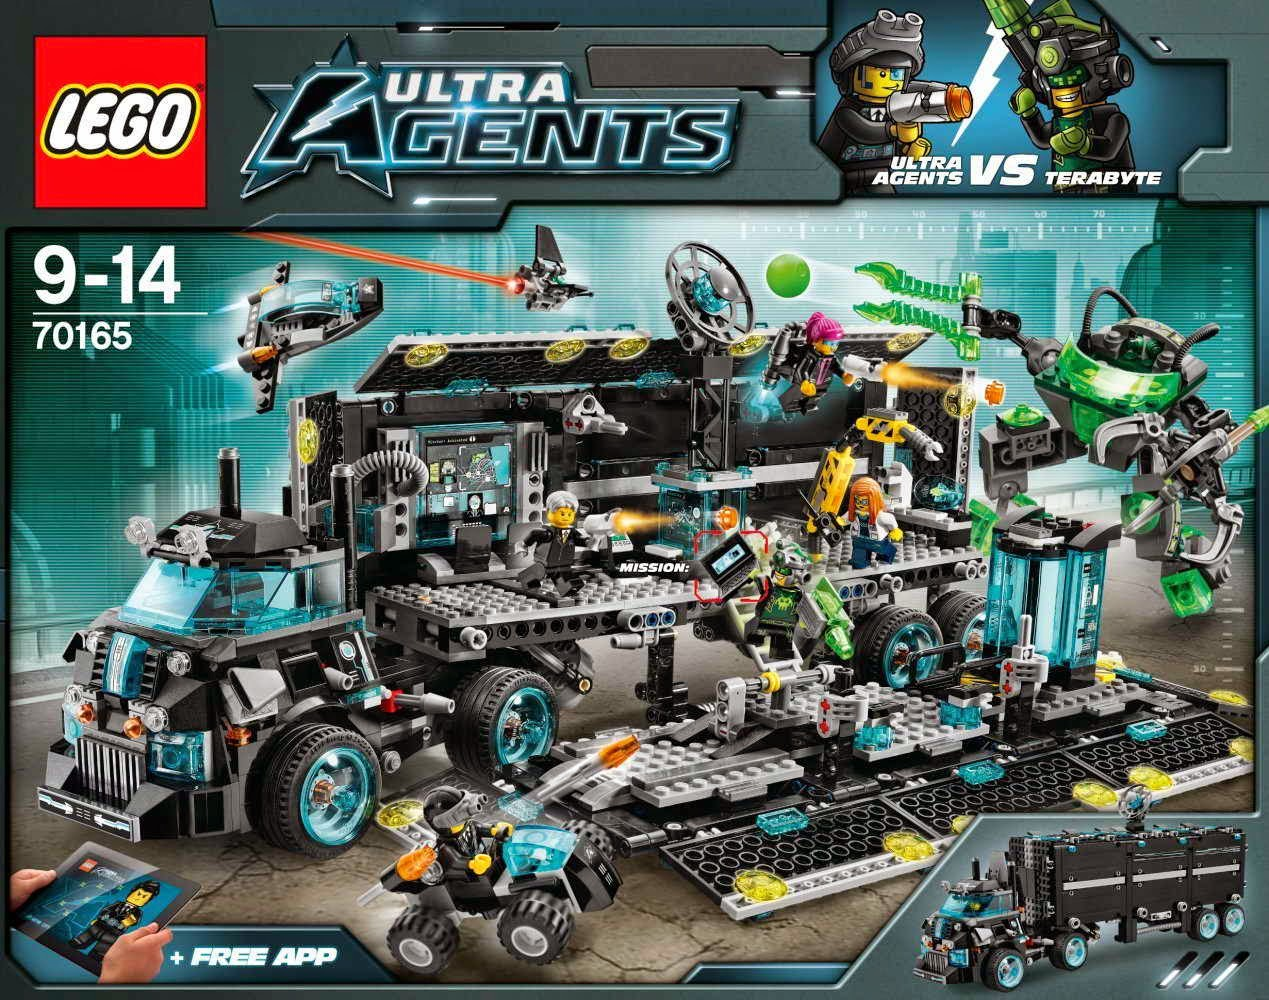 LEGO gosSIP: 230414 LEGO 70165 Ultra Agents Mission HQ box ... | 1269 x 1000 jpeg 300kB